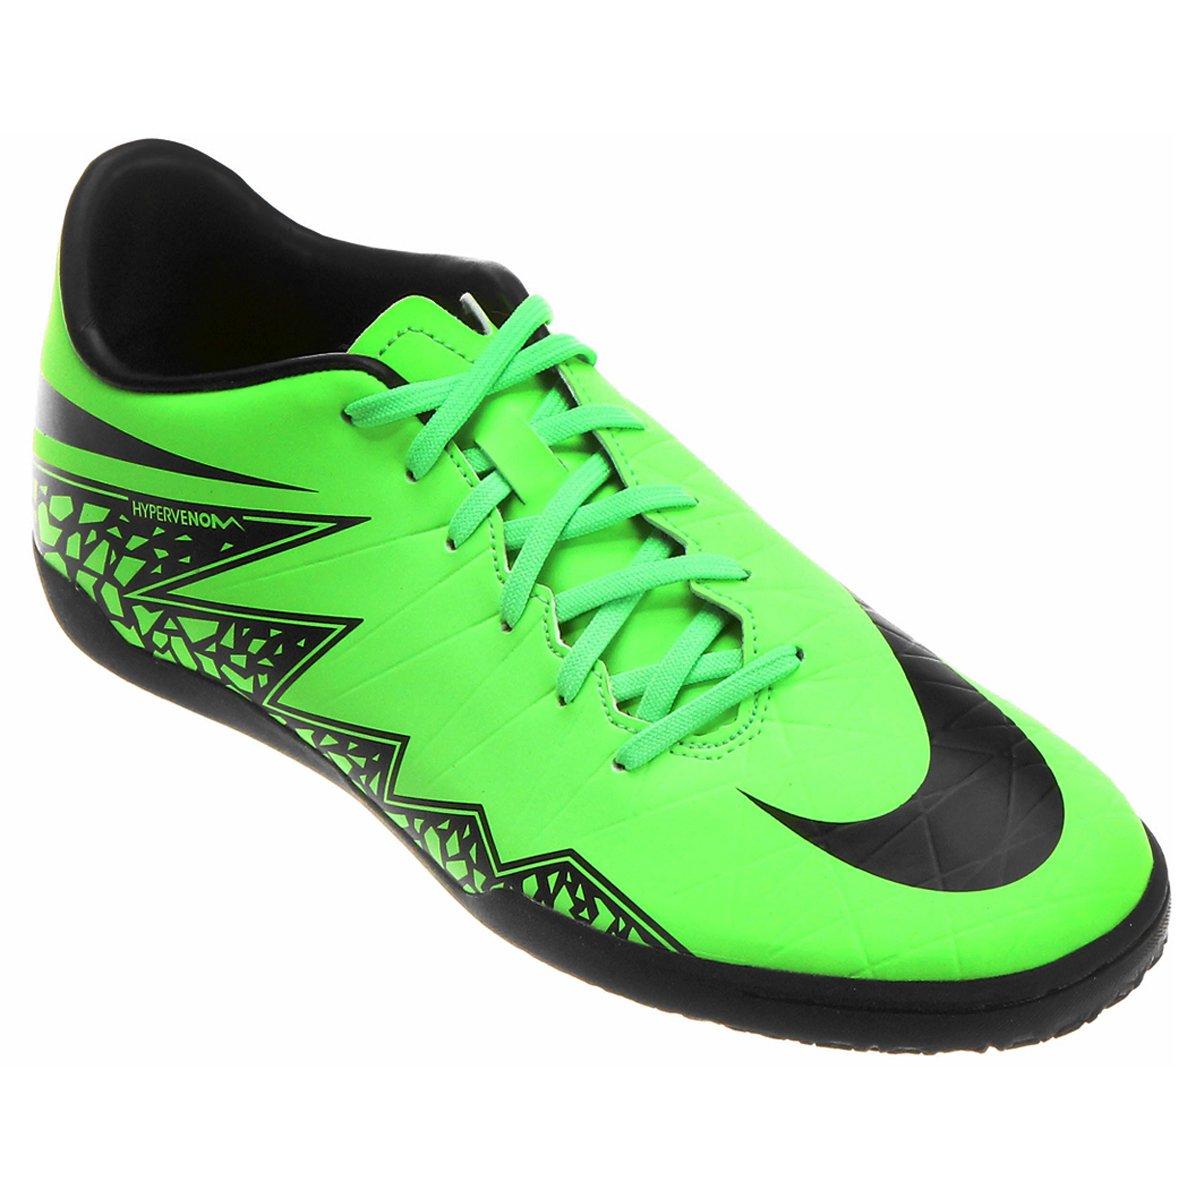 495e677916 Chuteira Futsal Nike Hypervenom Phelon 2 IC Masculina - Compre Agora ...